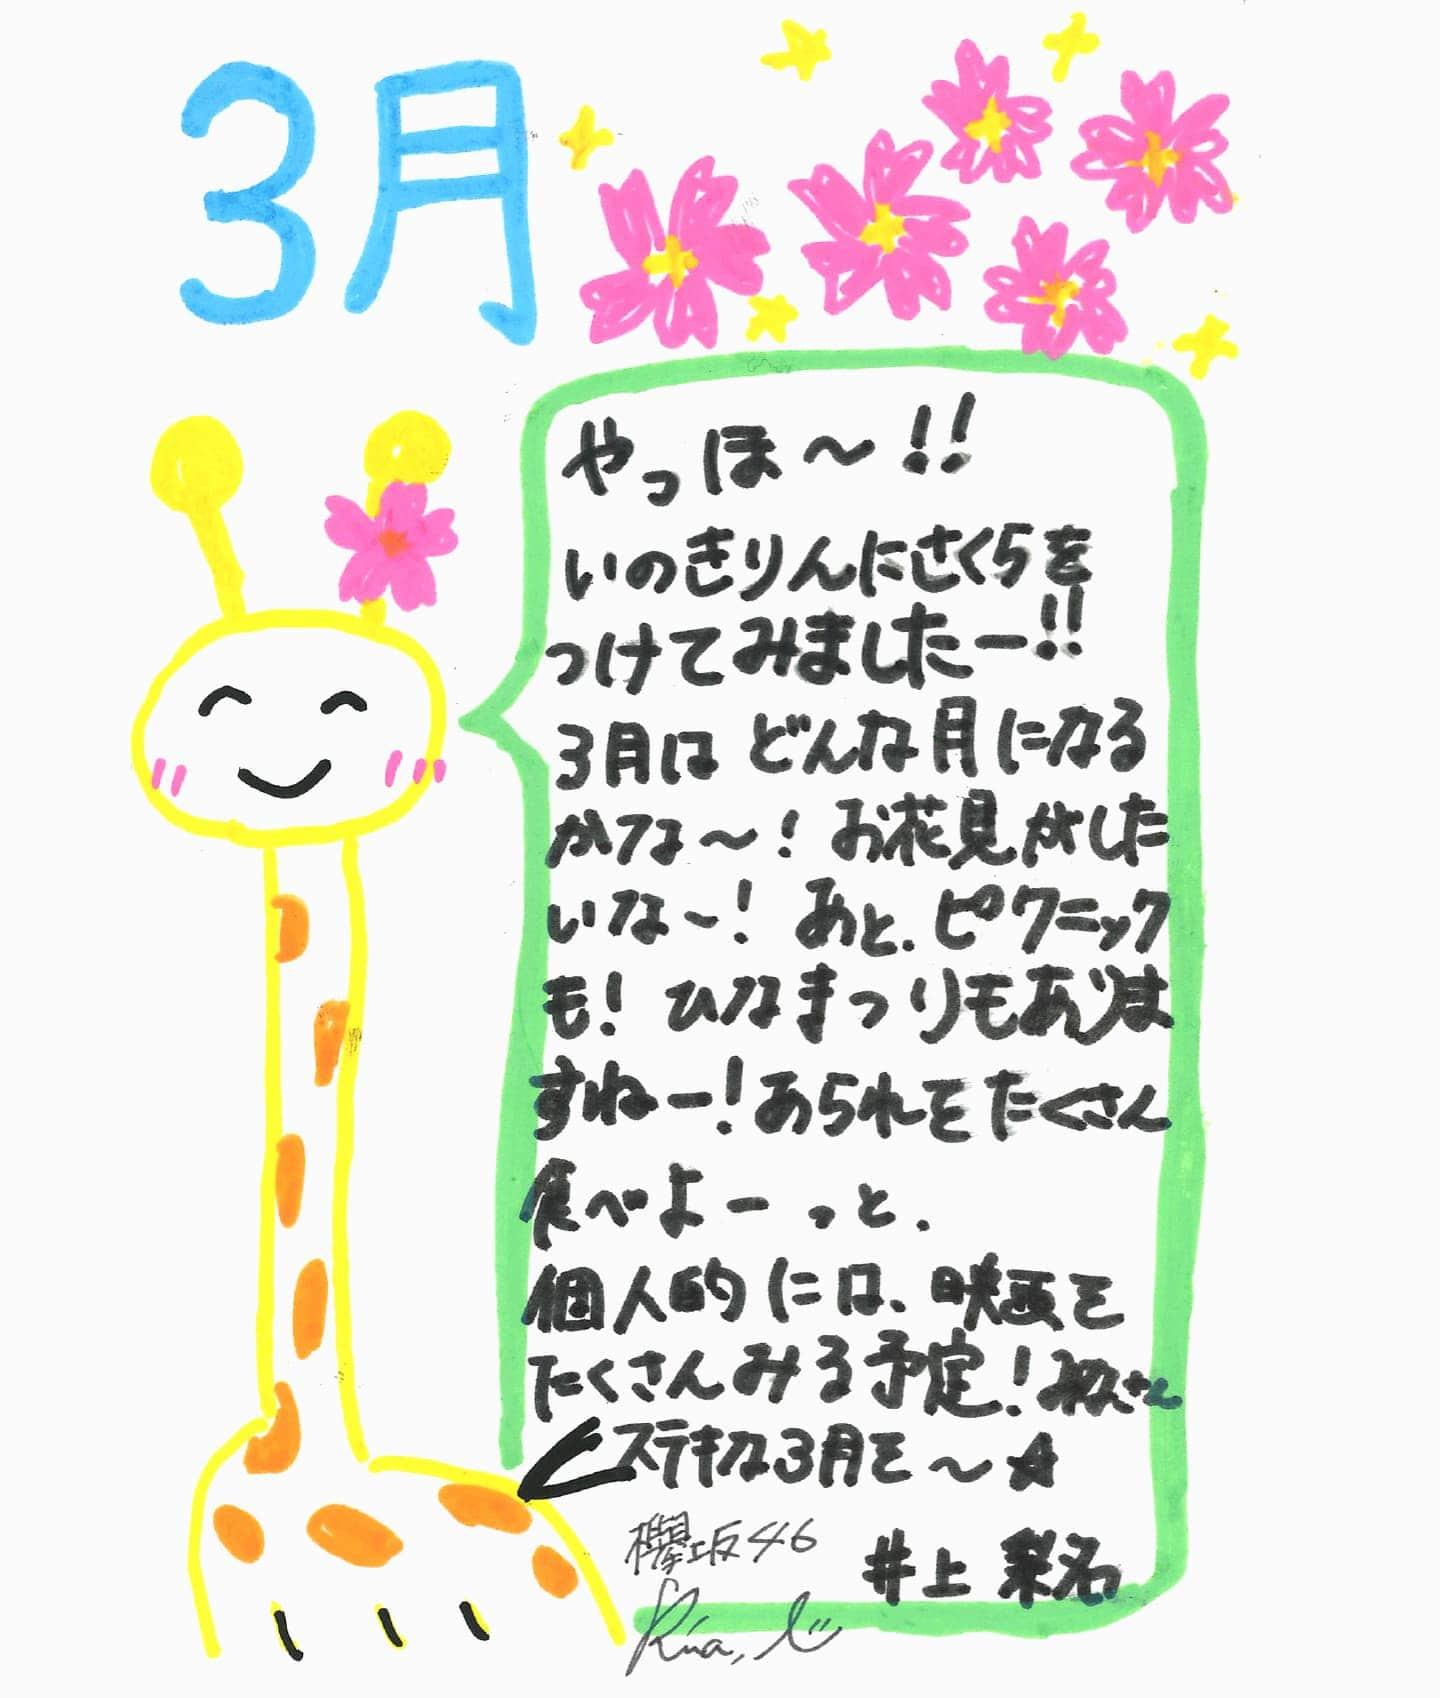 eafa7f6eb3b6b8ec4f4a0064b7376